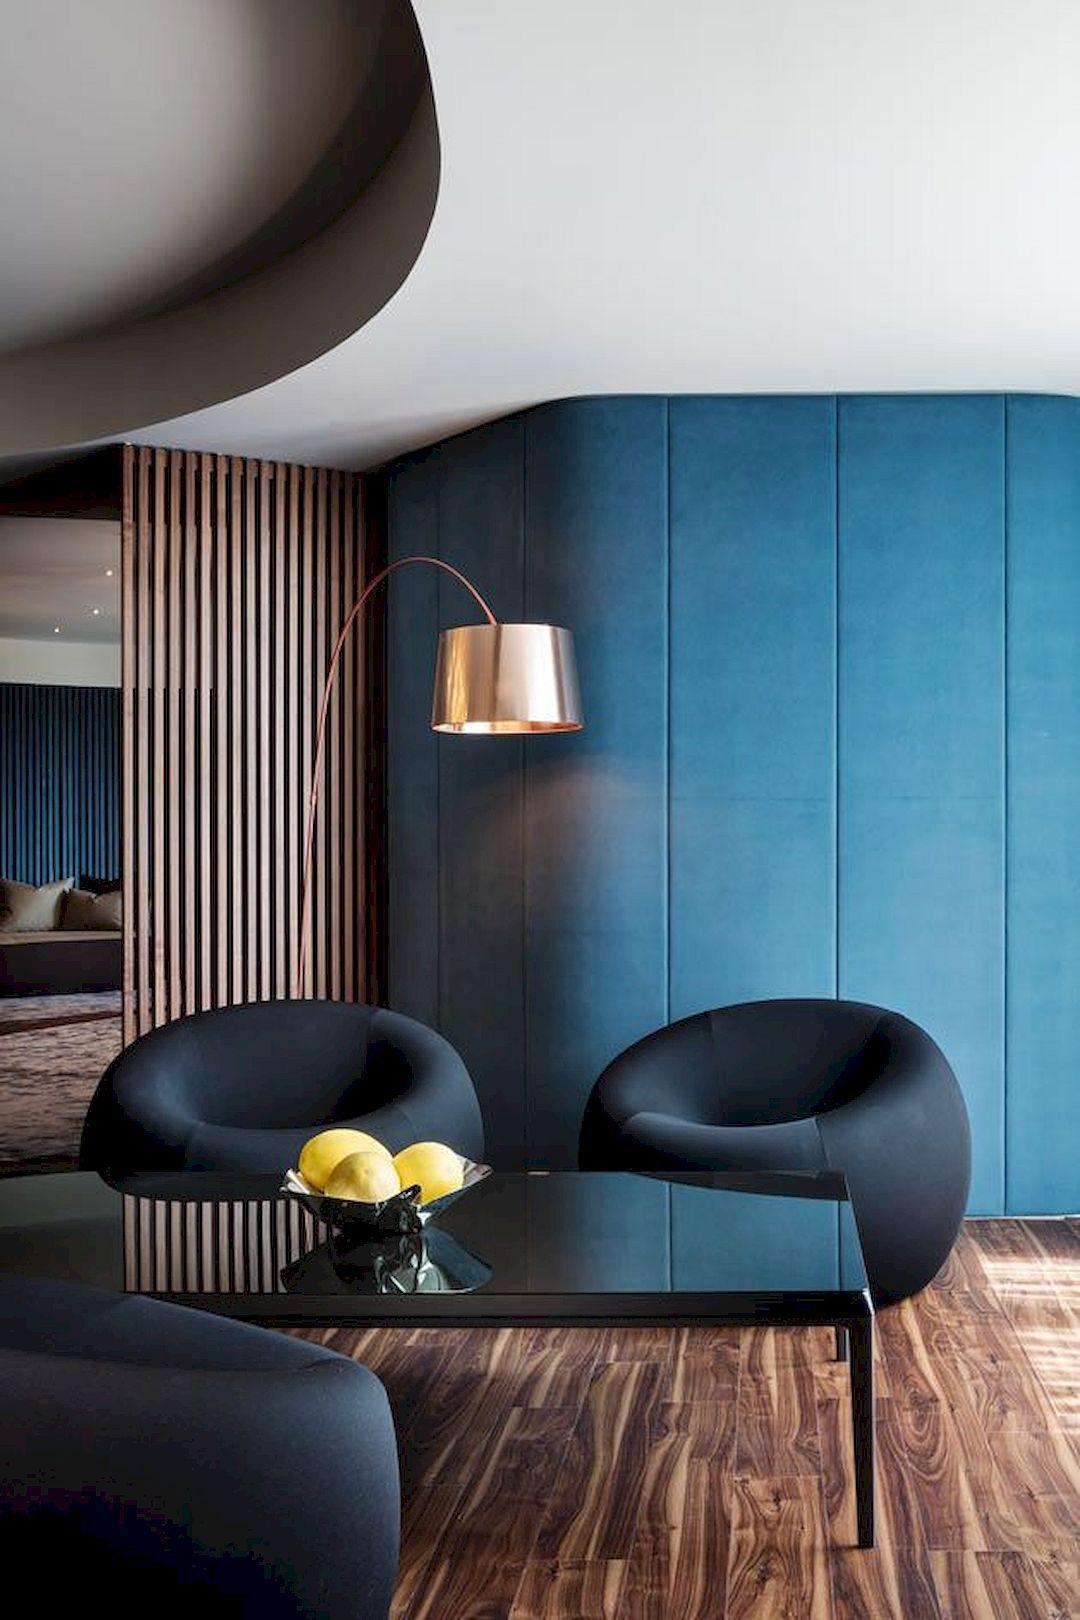 Unconventional Interior Home Designs Contrast Interior Design Contemporary Interior Design Home Interior Design